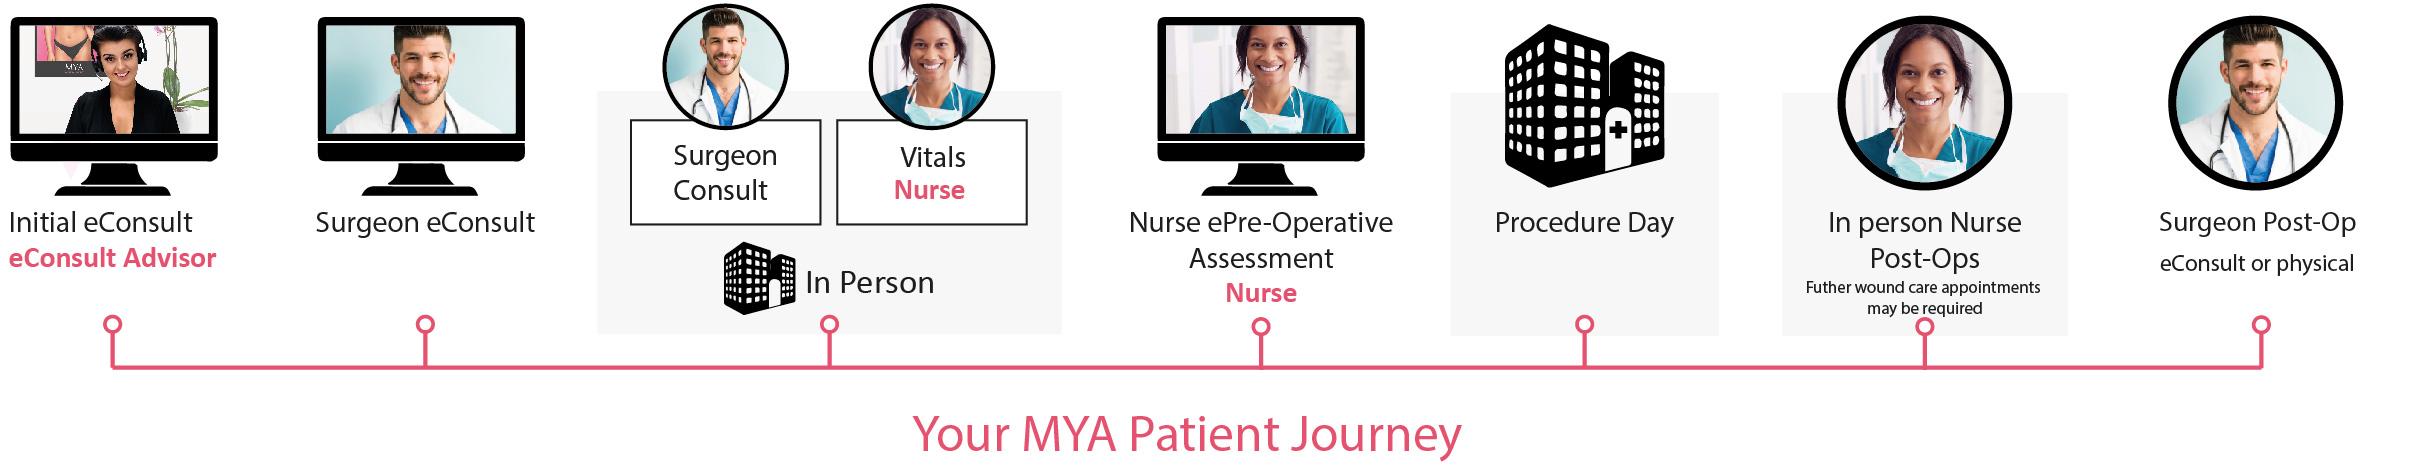 MYA patient Journey diagram